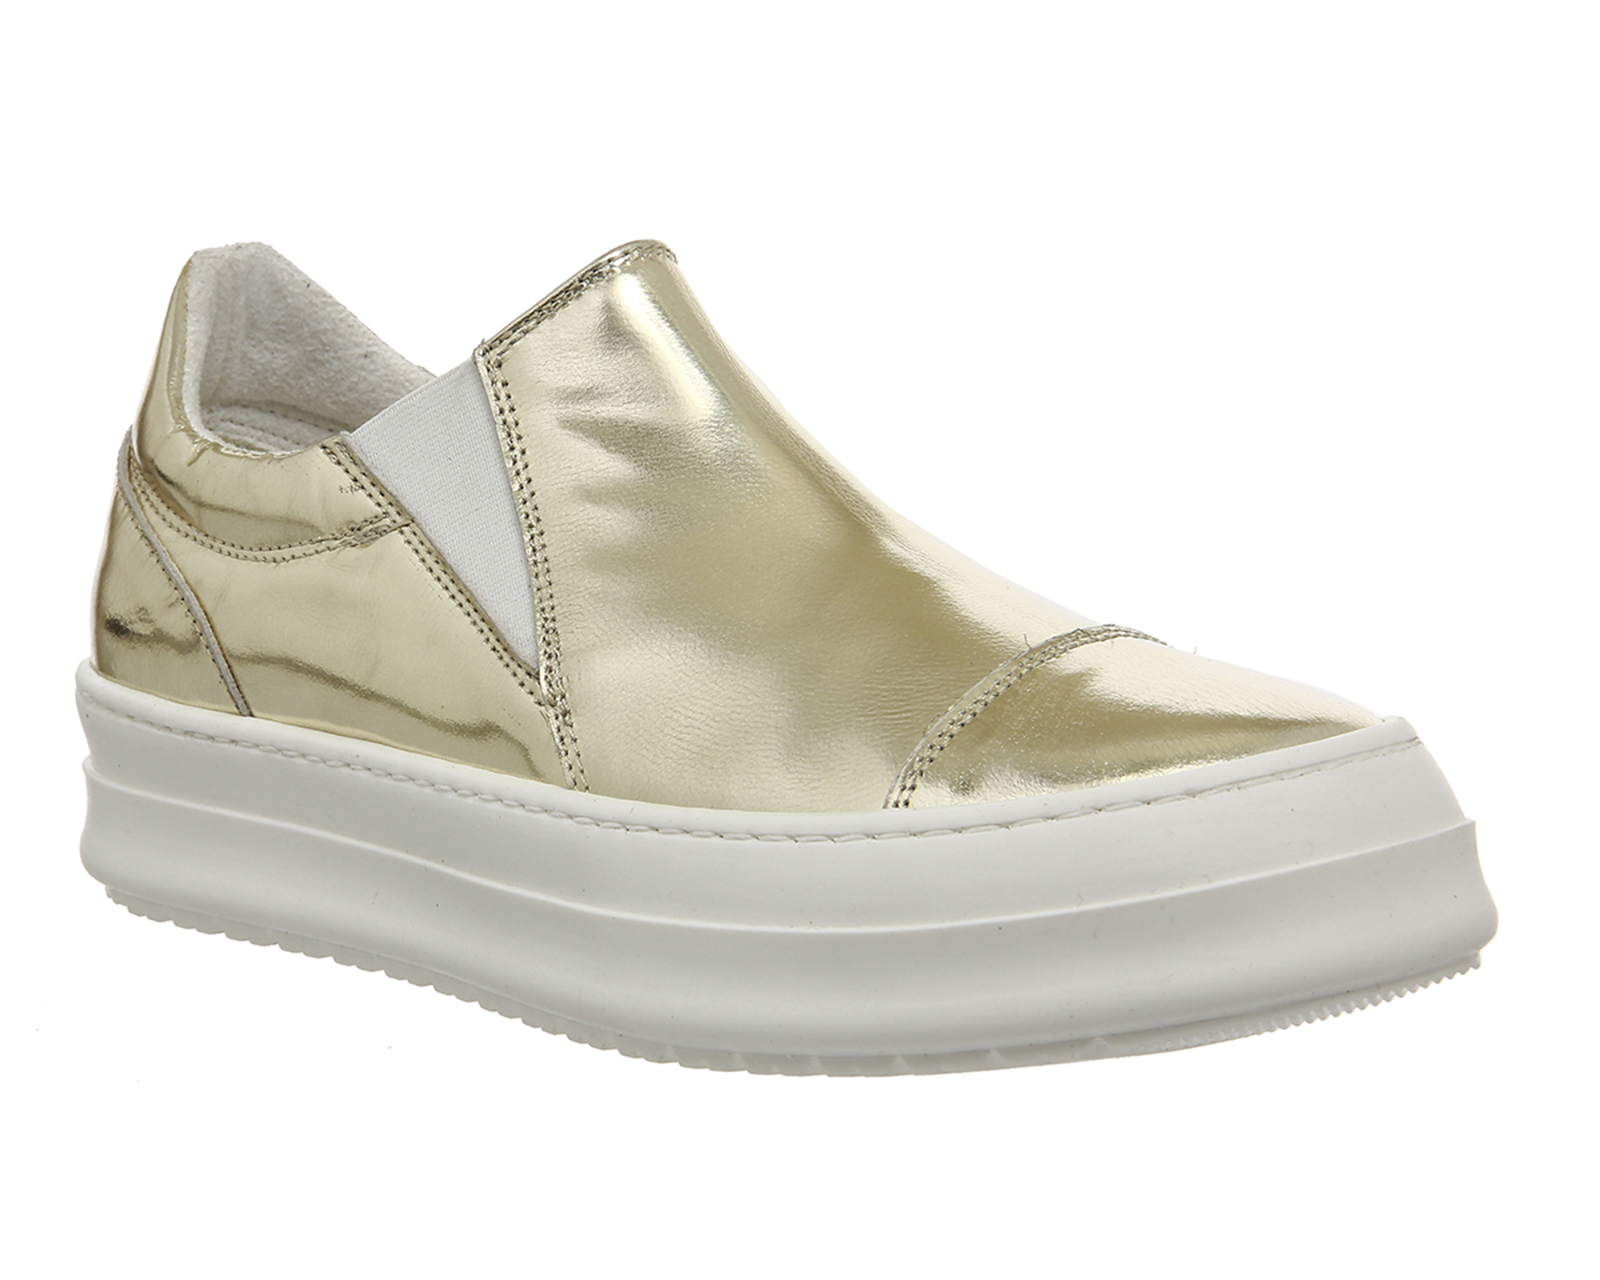 Oki Kutsu San Sneaker Womens Trainers Gold White Leather 2339894015